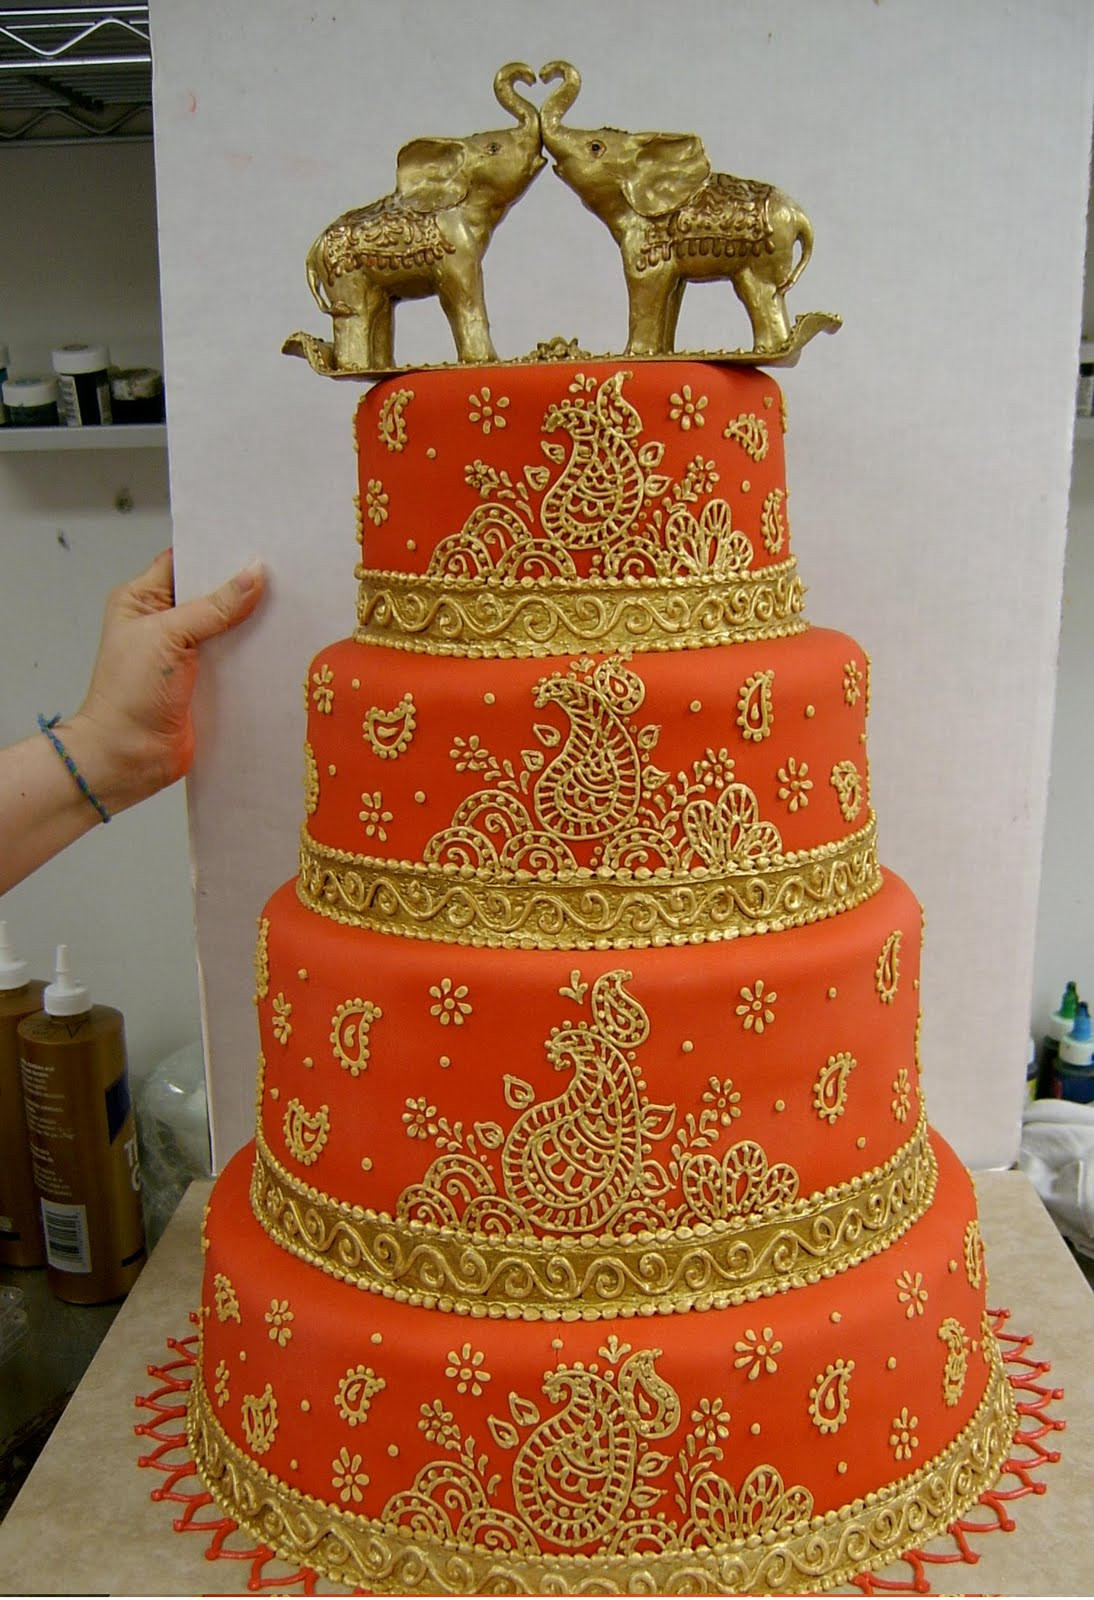 Indian Wedding Cakes  Indian Wedding Cake Decorated With Mahndi And Elephants